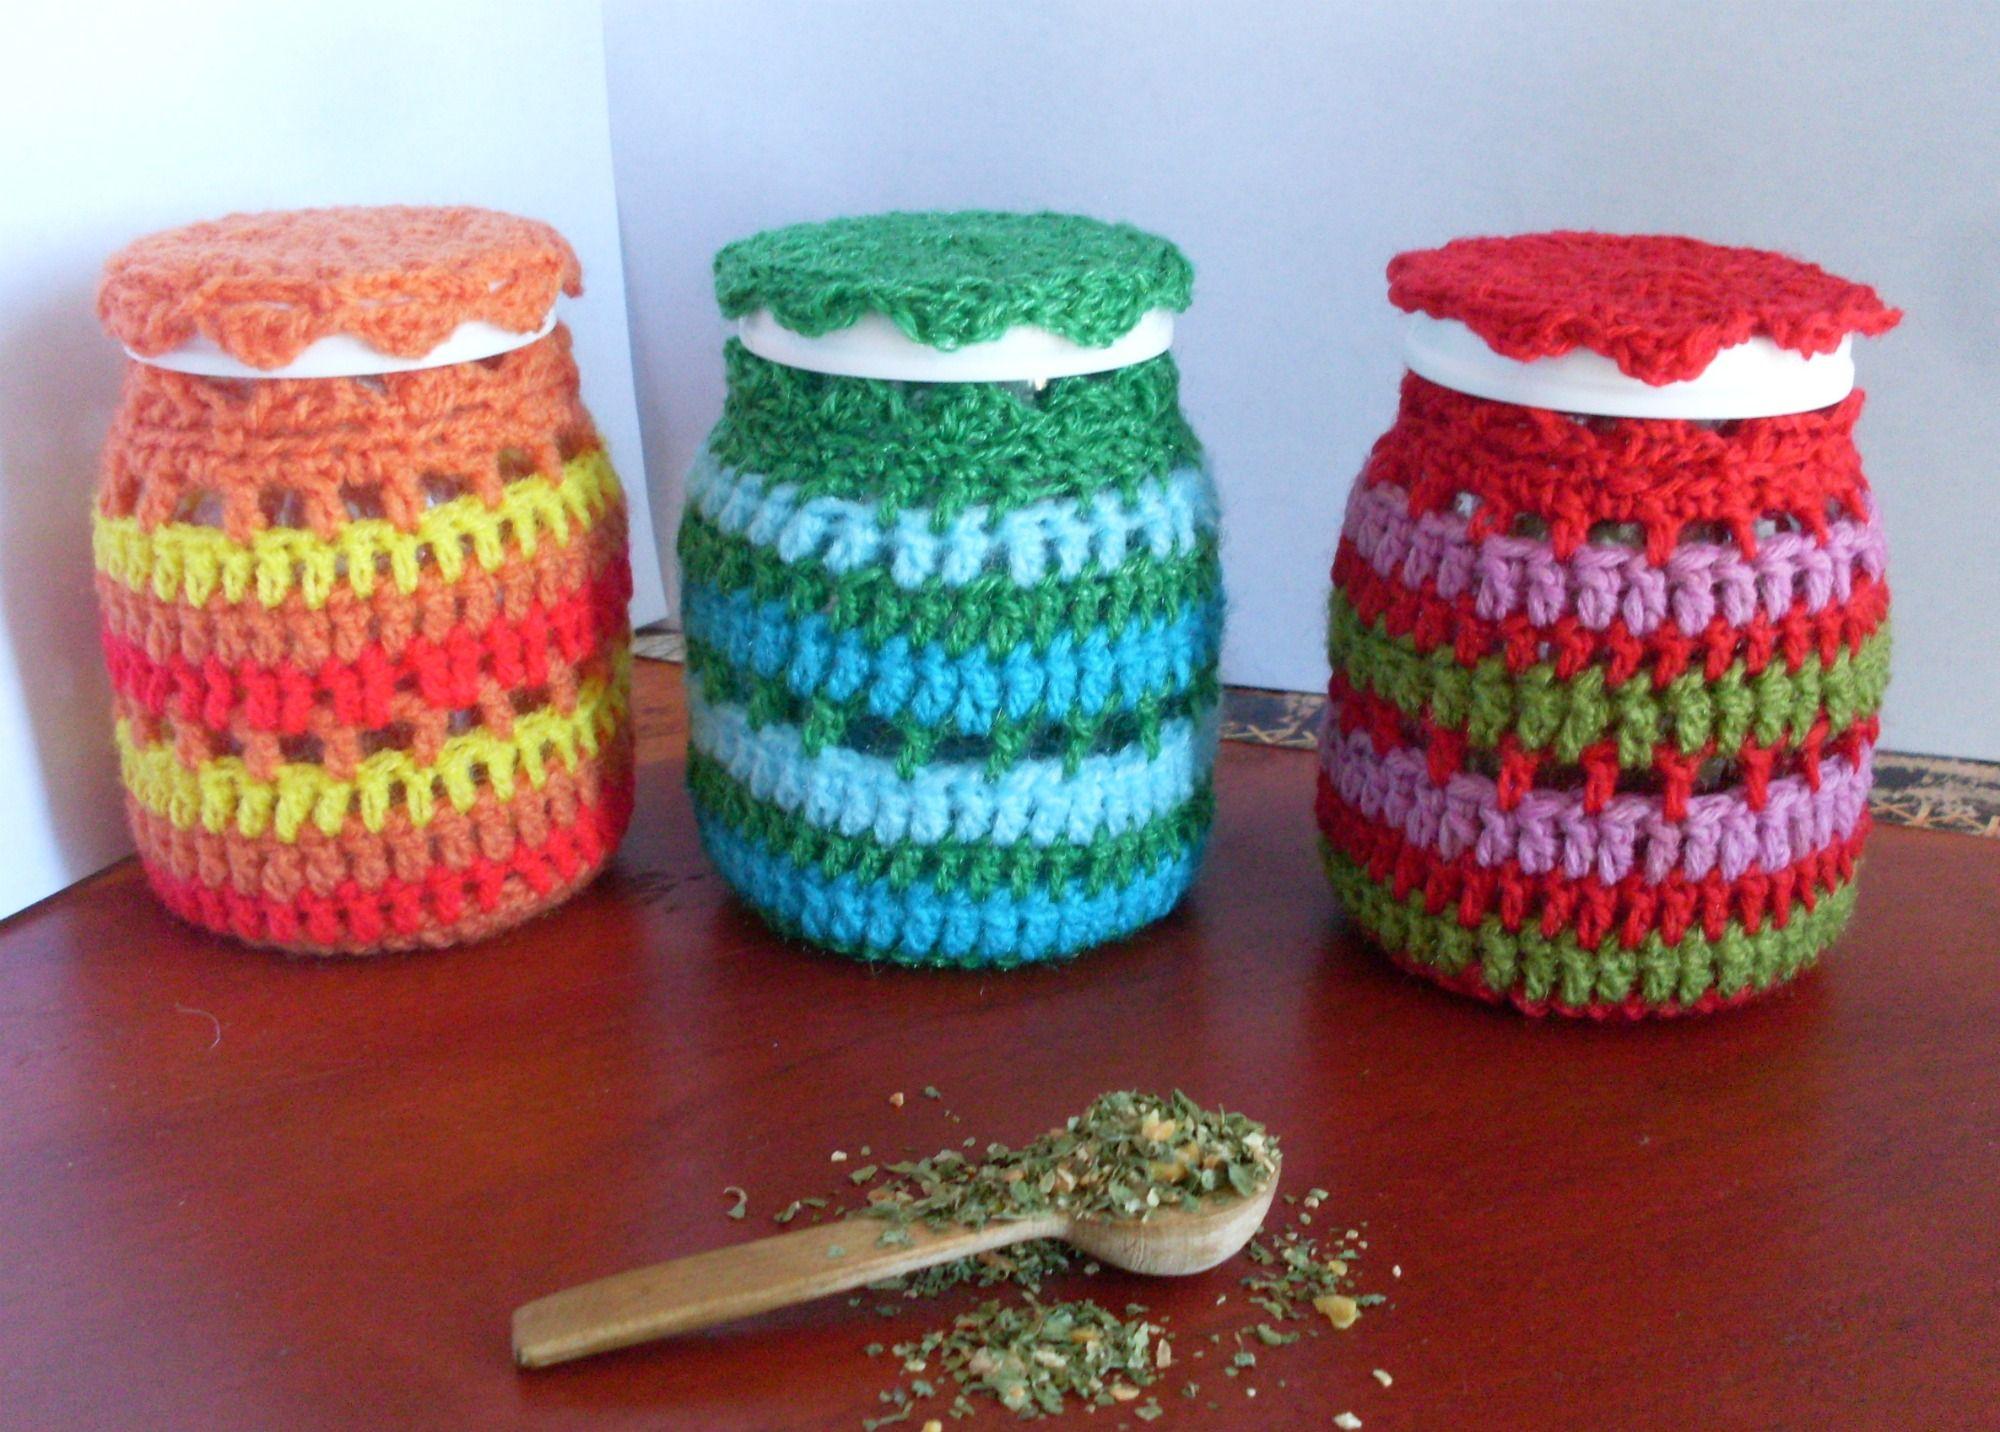 Frascos tejidos a crochet jars with covers woven crochet for Decoracion hogar a crochet